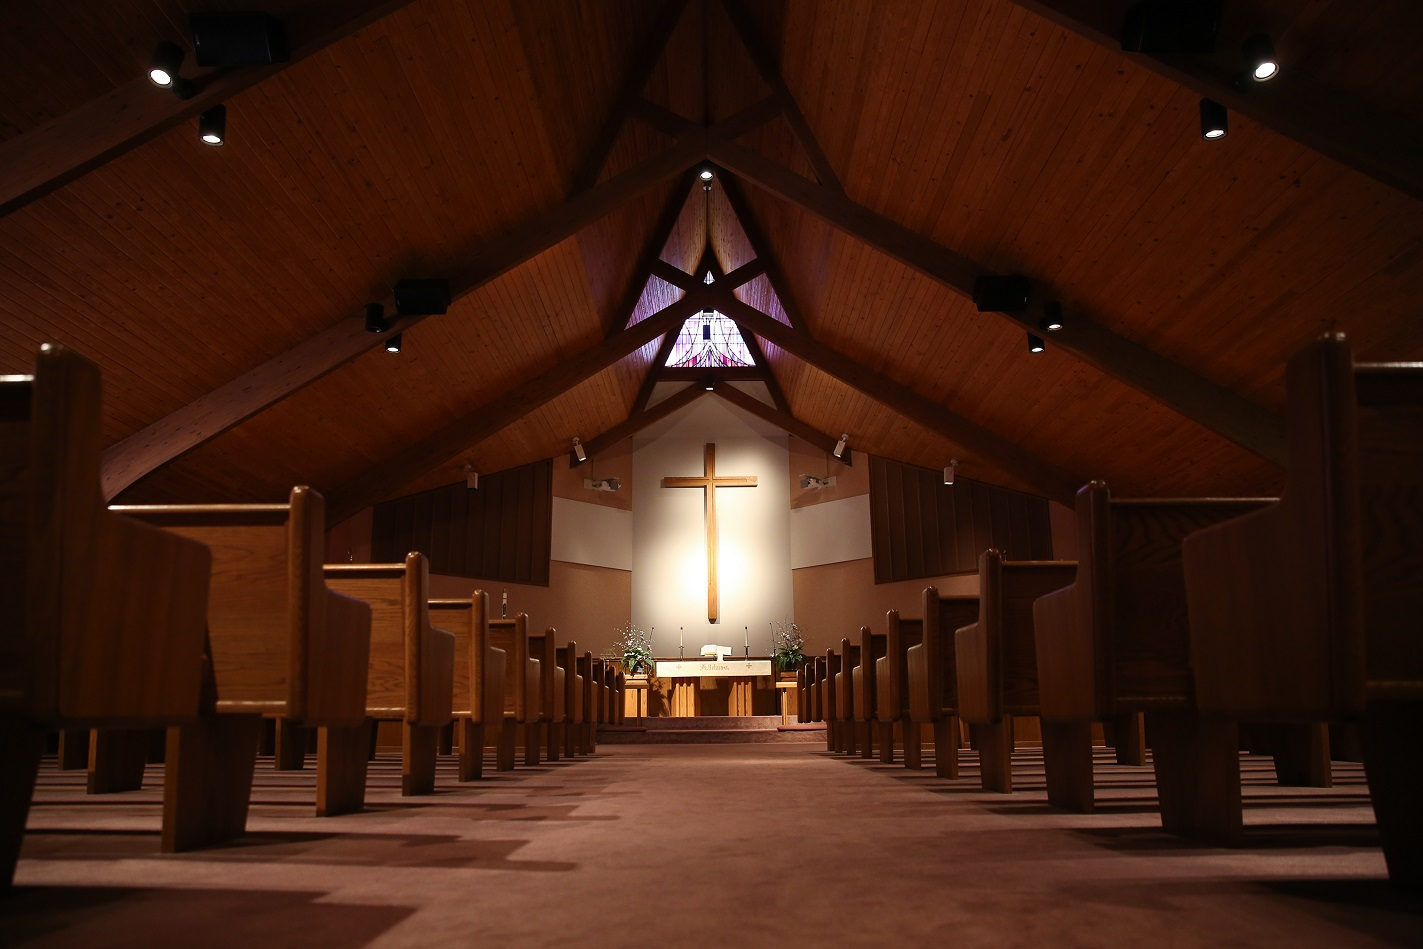 sanctuary, umc, east alton first untied methodist church